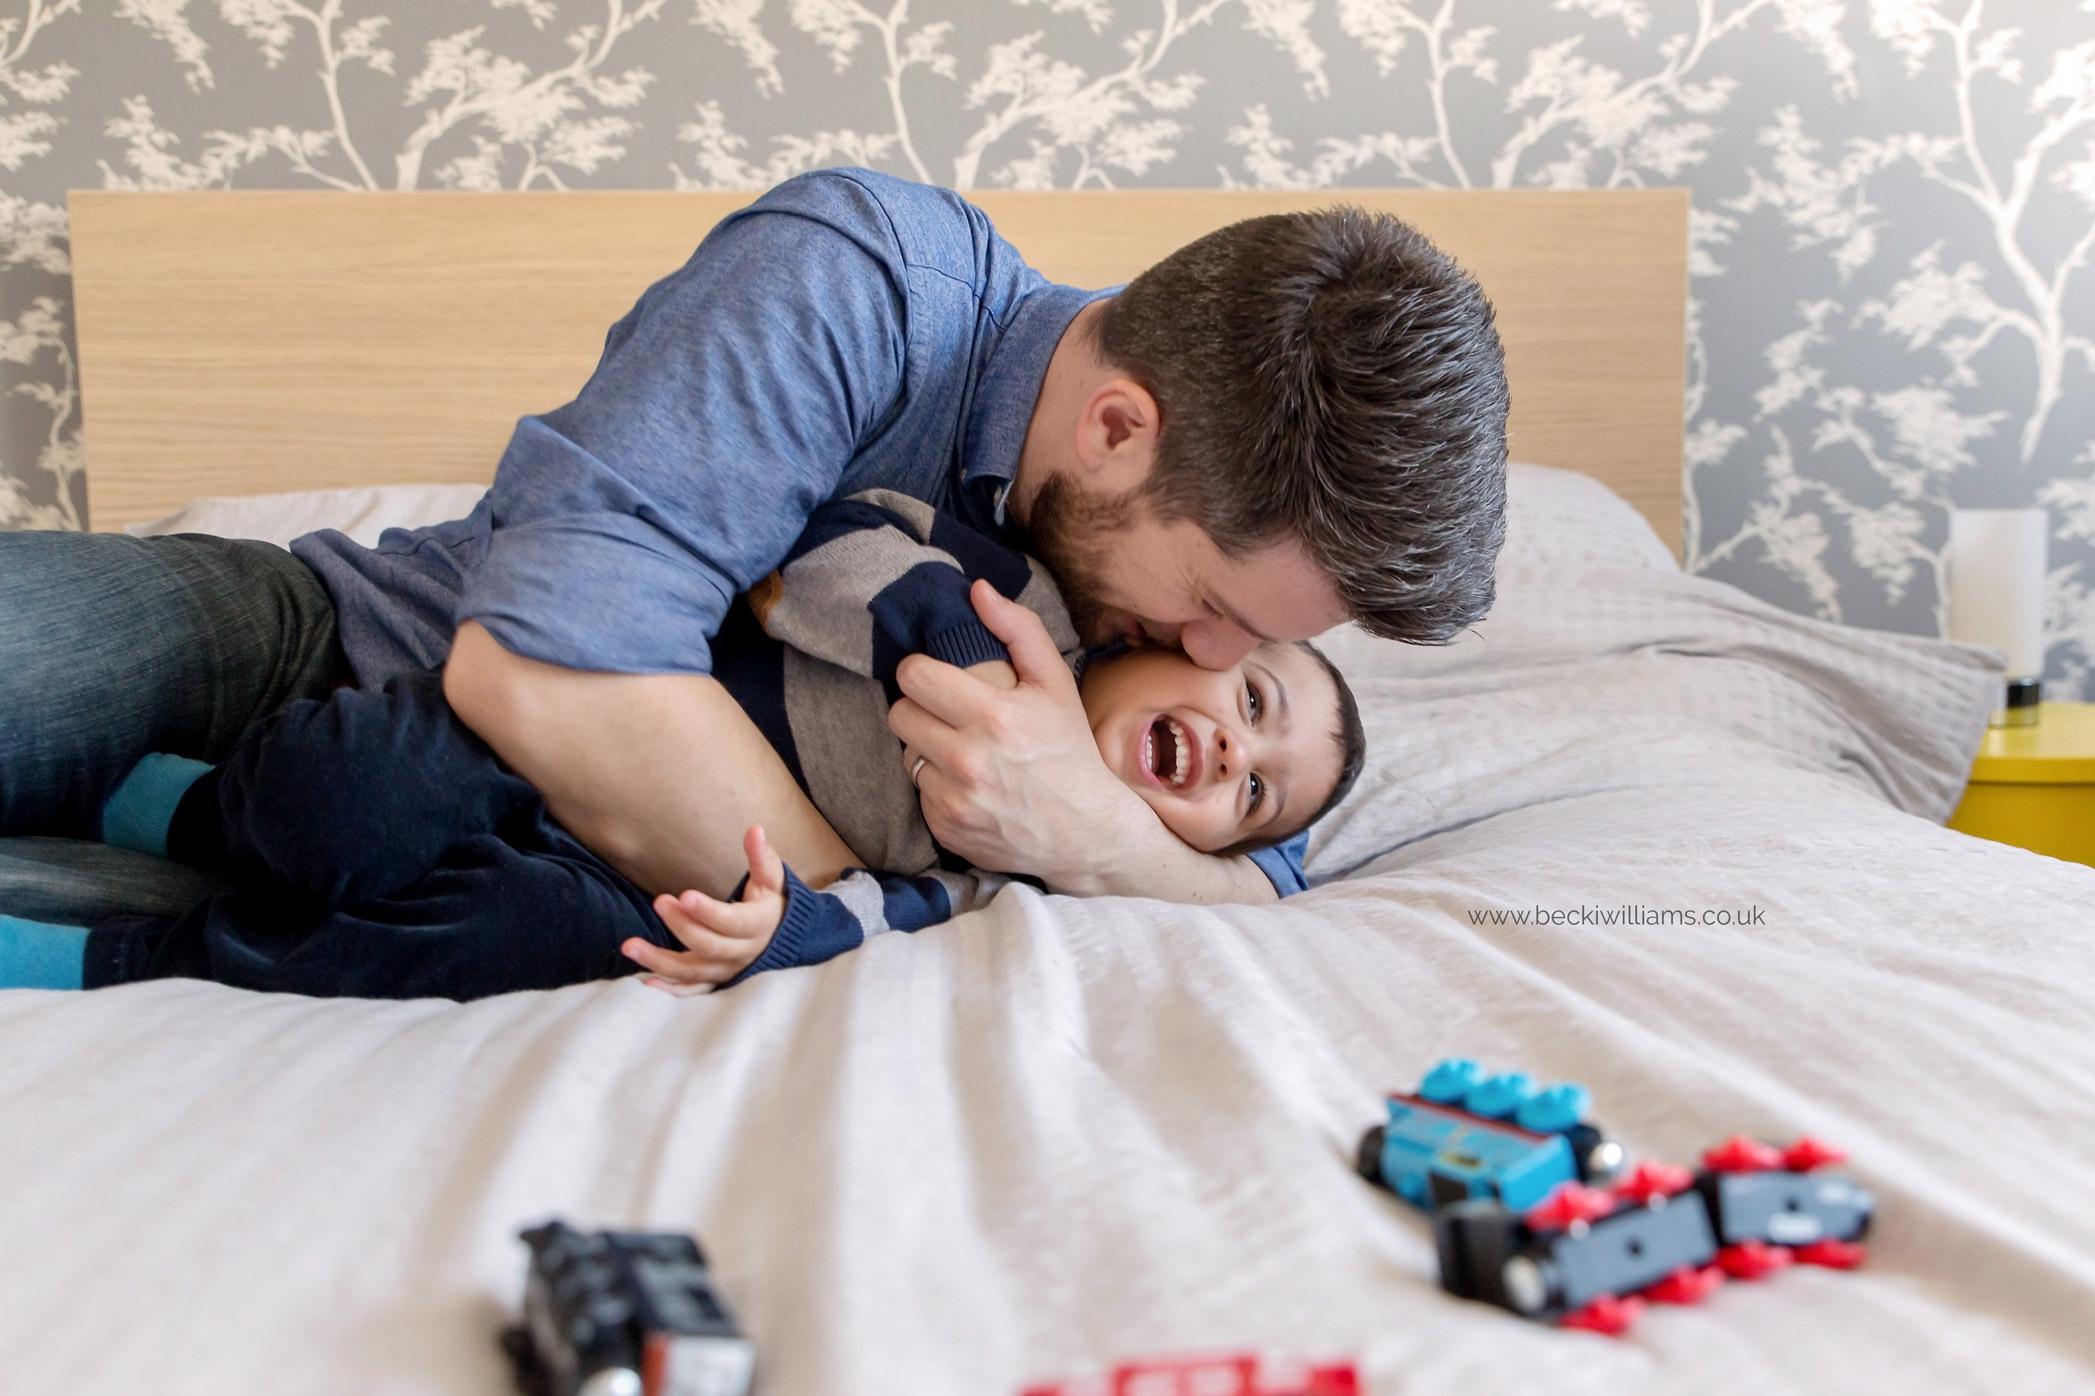 lifestyle-baby-photography-hemel-hempstead-fun-dad-son-trains